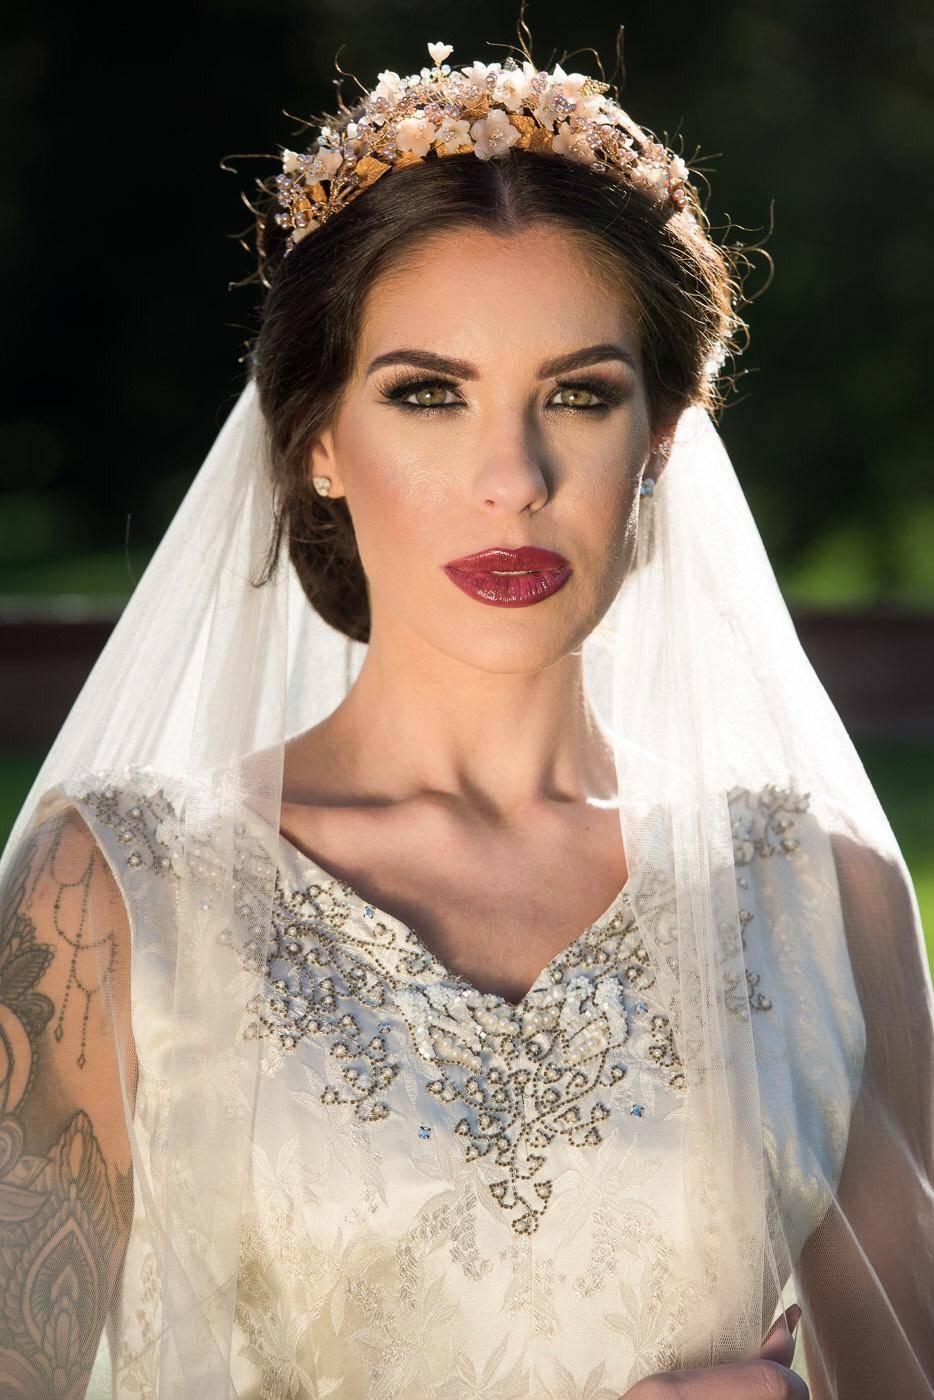 wedding hair wedding make up wedding tiara bride wedding dress real weddings